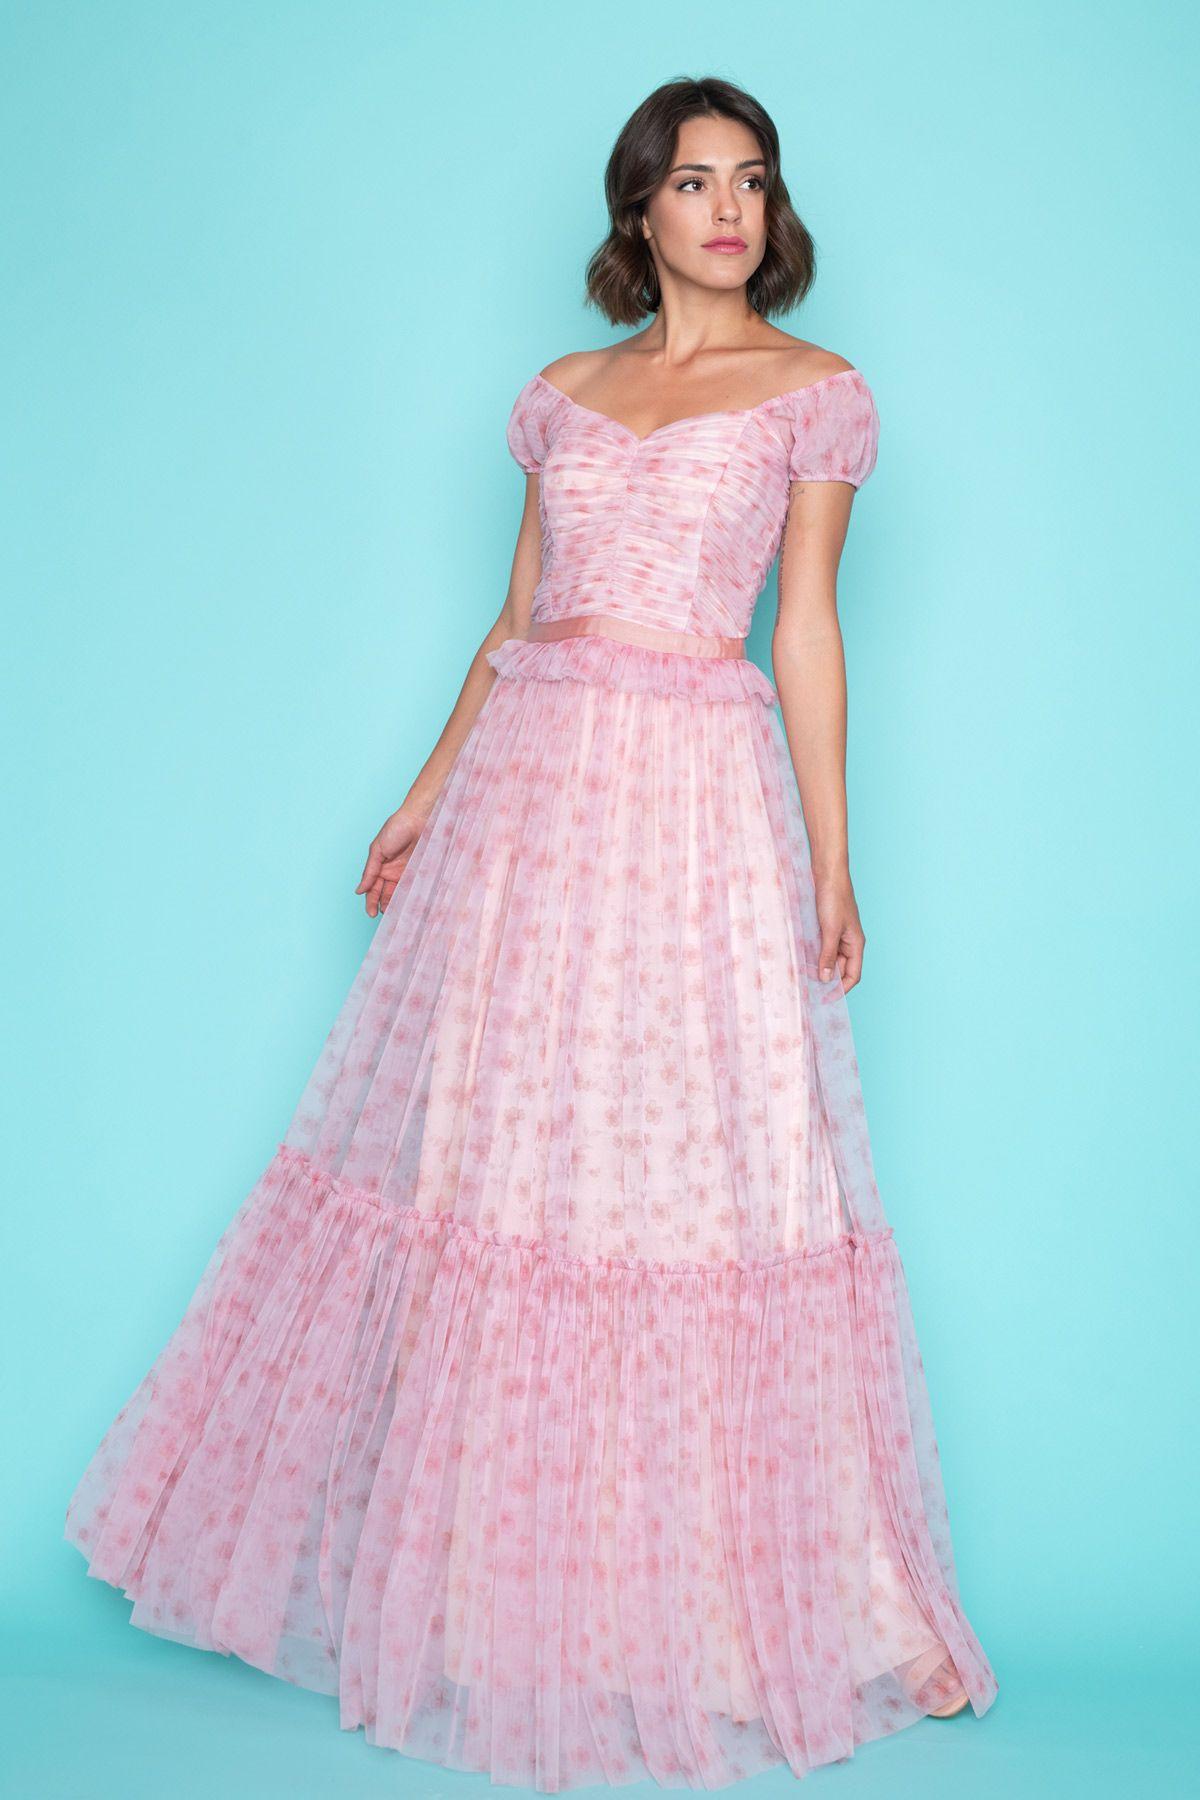 a22079703dd Μεσάτο Ροζ Maxi Φόρεμα